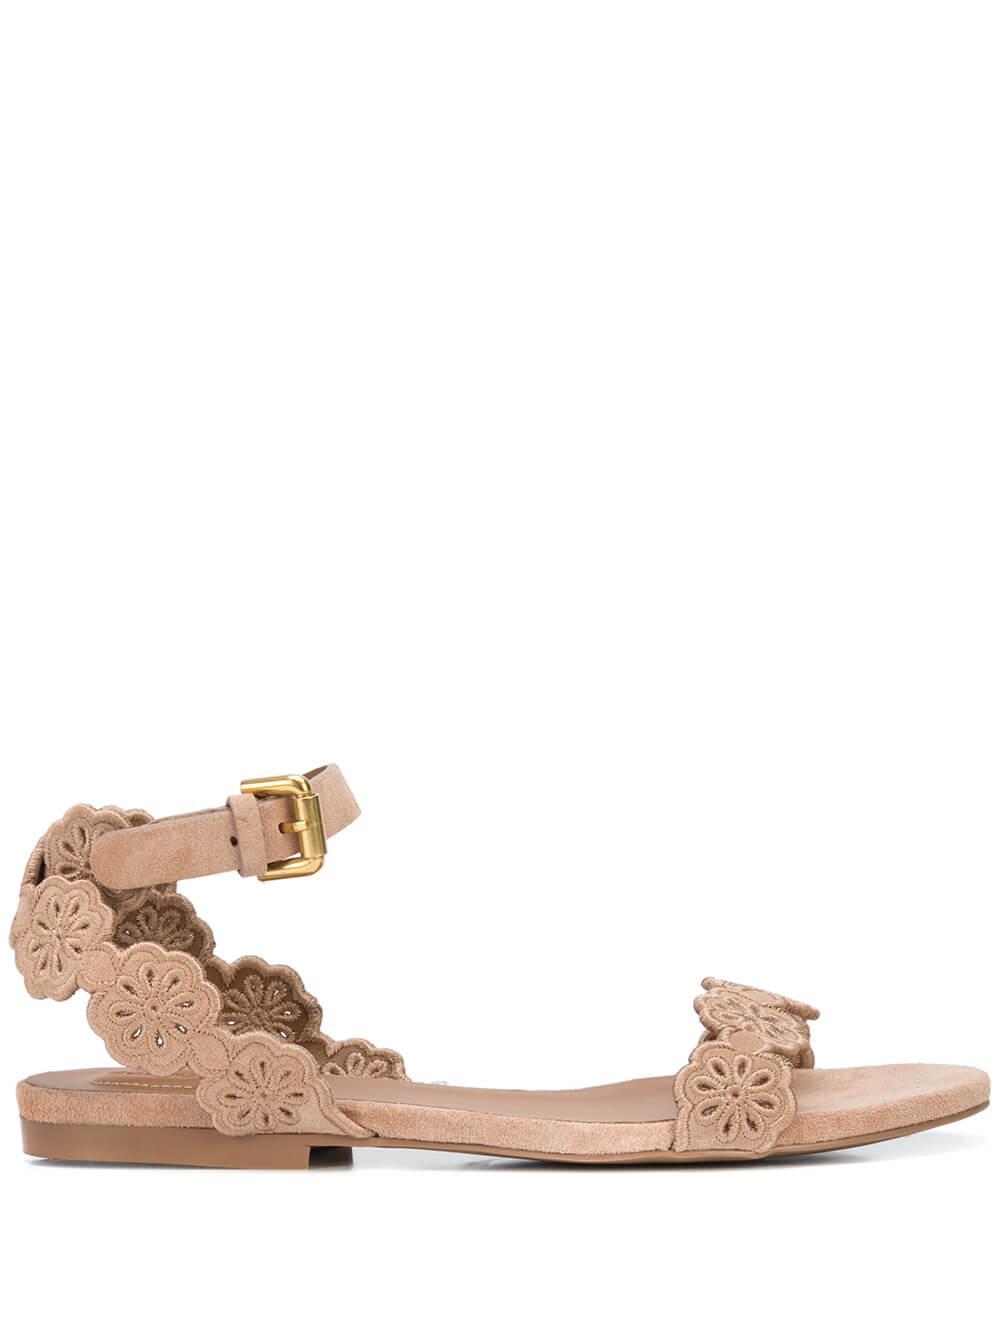 Scallop Flower Ankle Strap Sandal